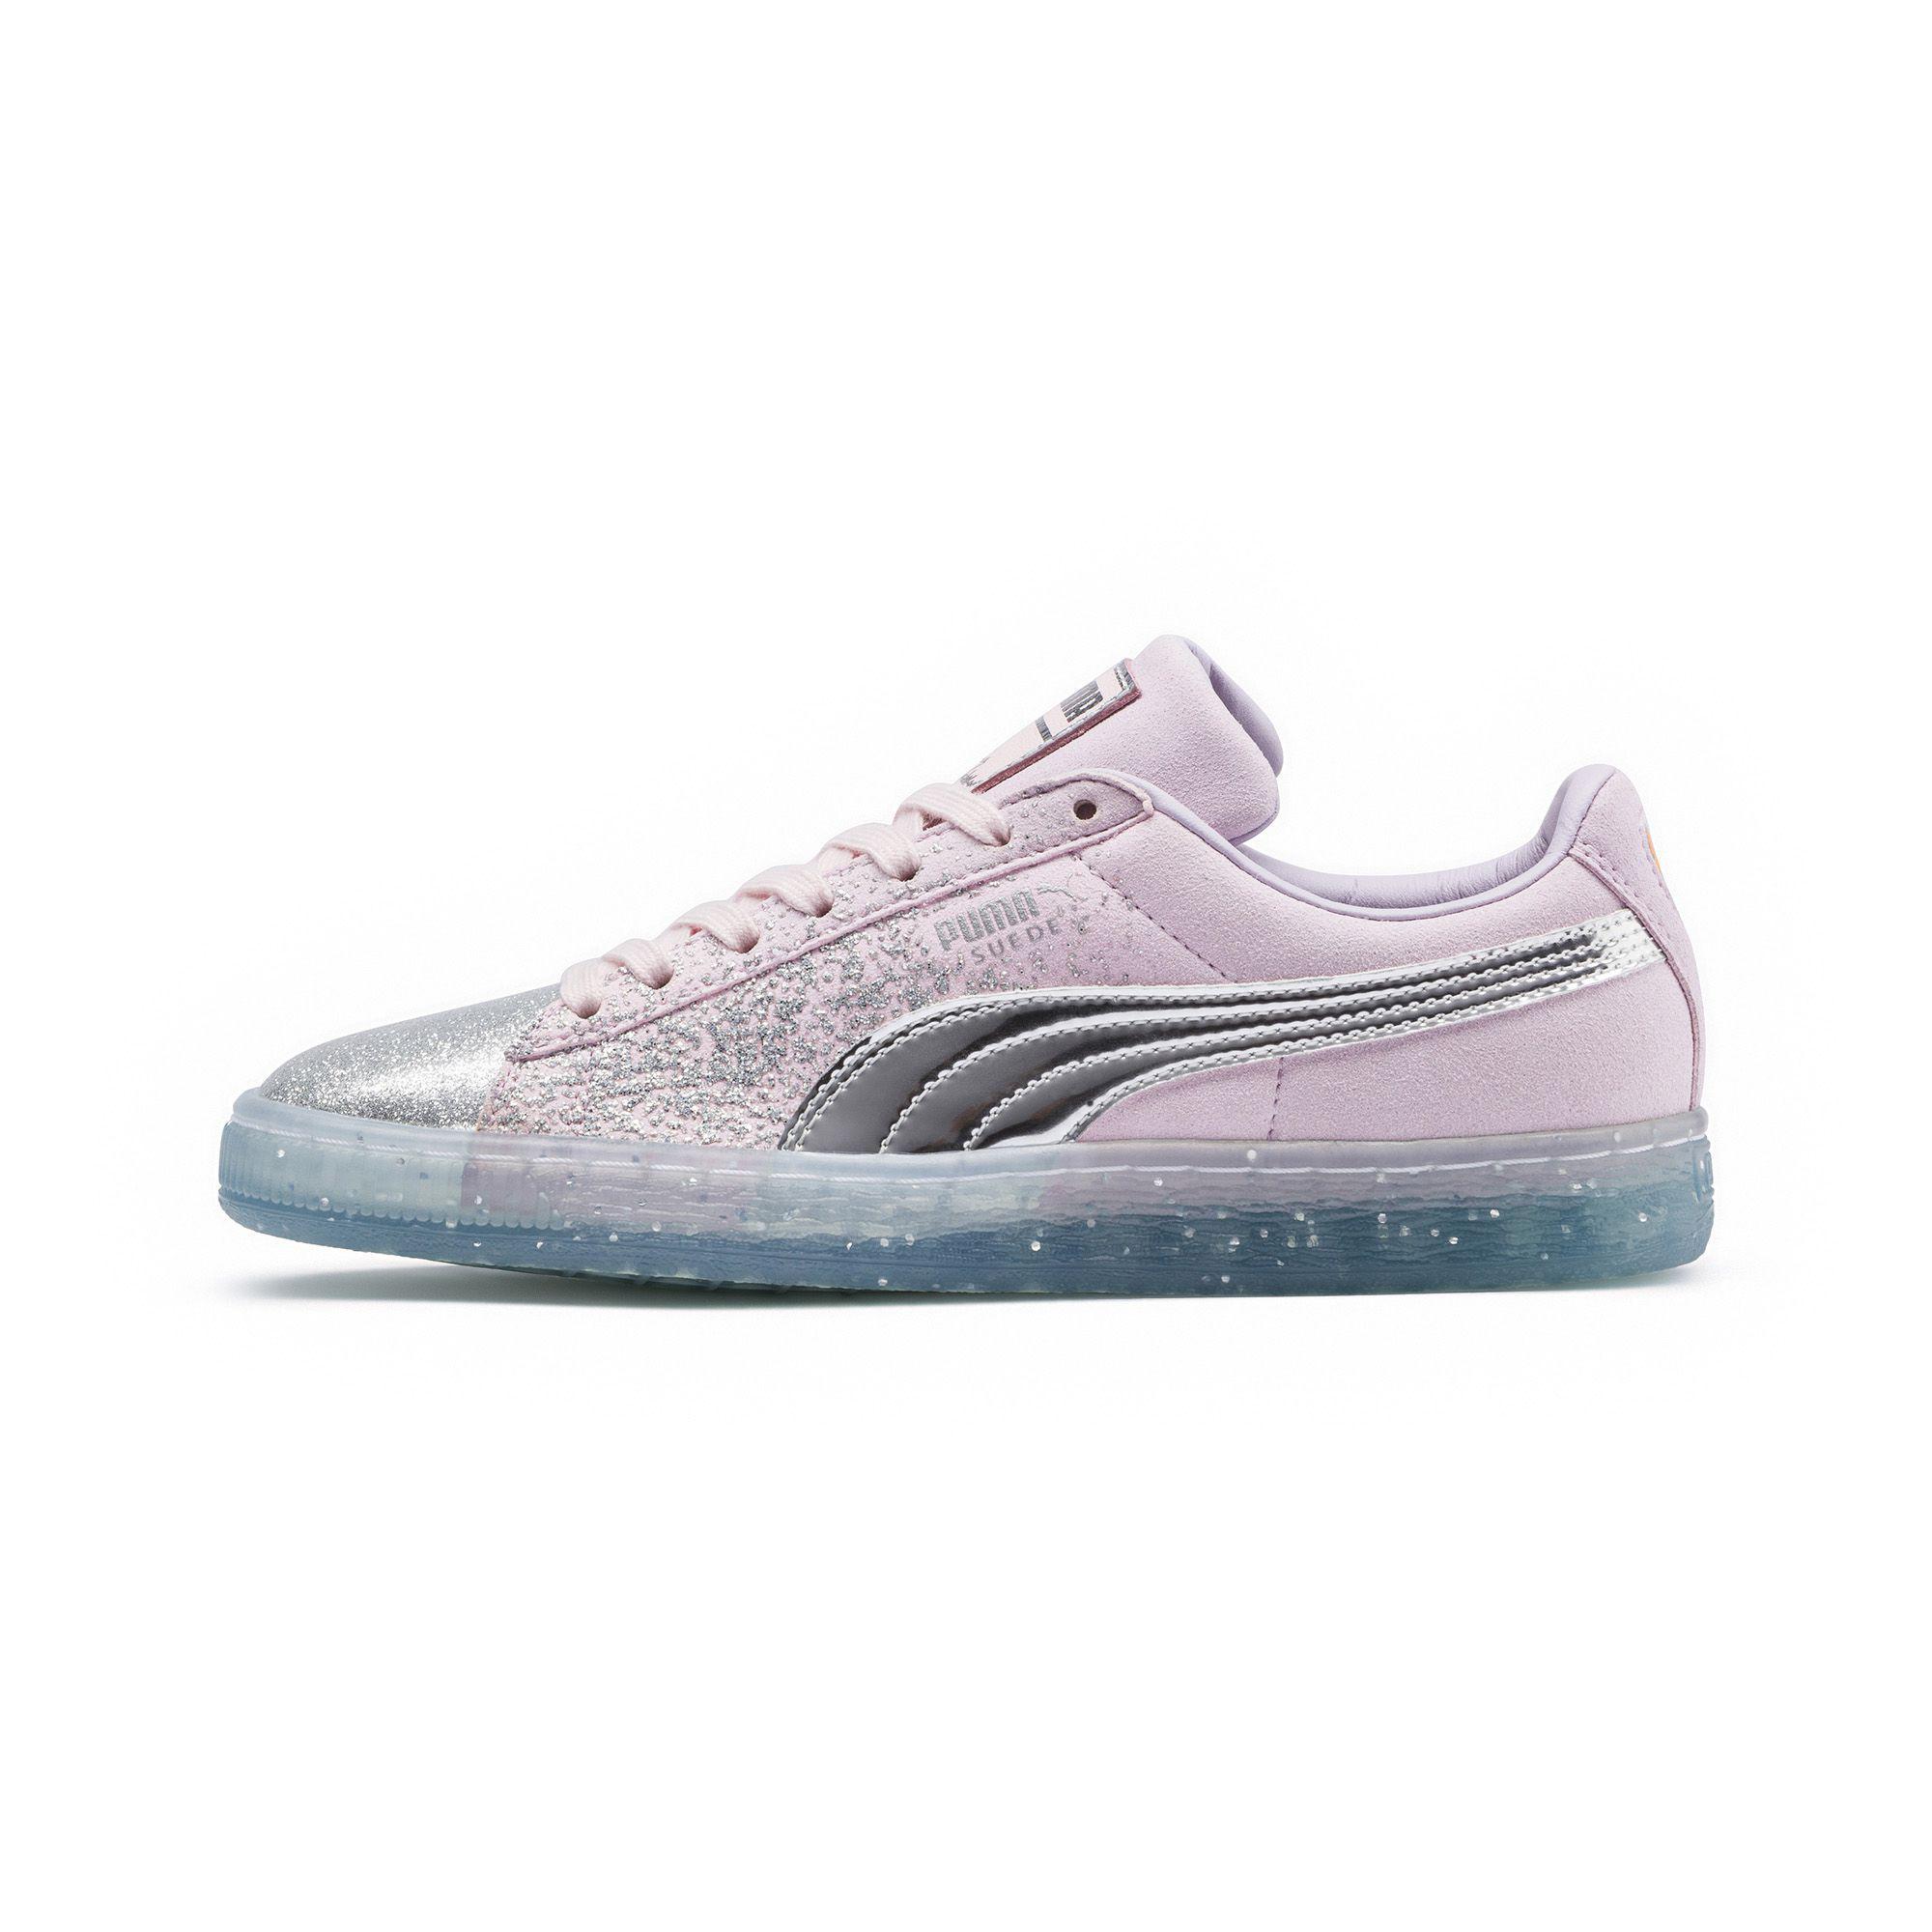 4a83d7fcb61 Lyst - PUMA X Sophia Webster Candy Princess Women s Sneakers